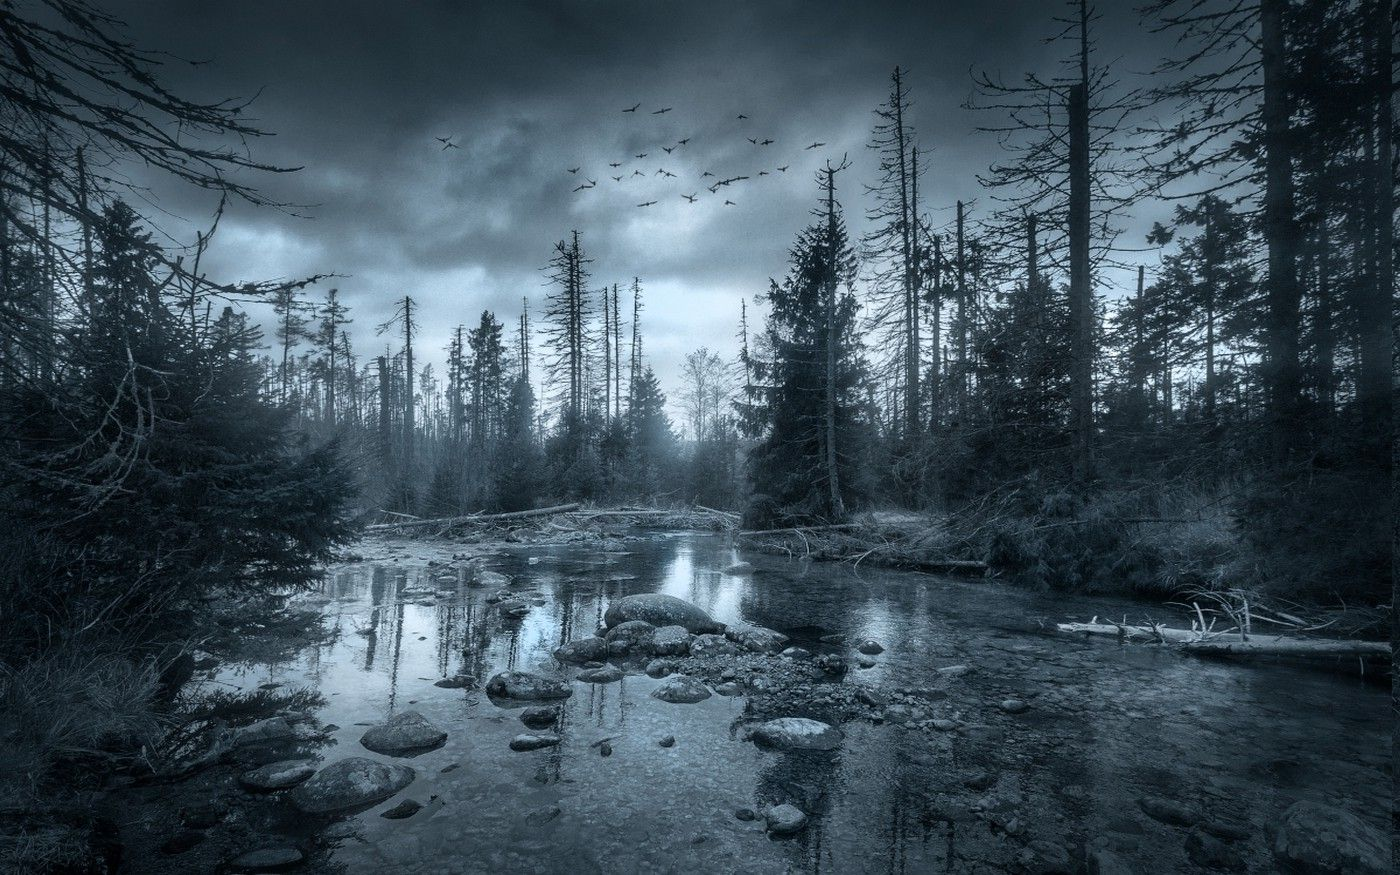 Nature Landscape River Forest Clouds Morning Birds Flying Trees Dark Mist Wallpapers Hd Desktop And Mobile Backgrounds